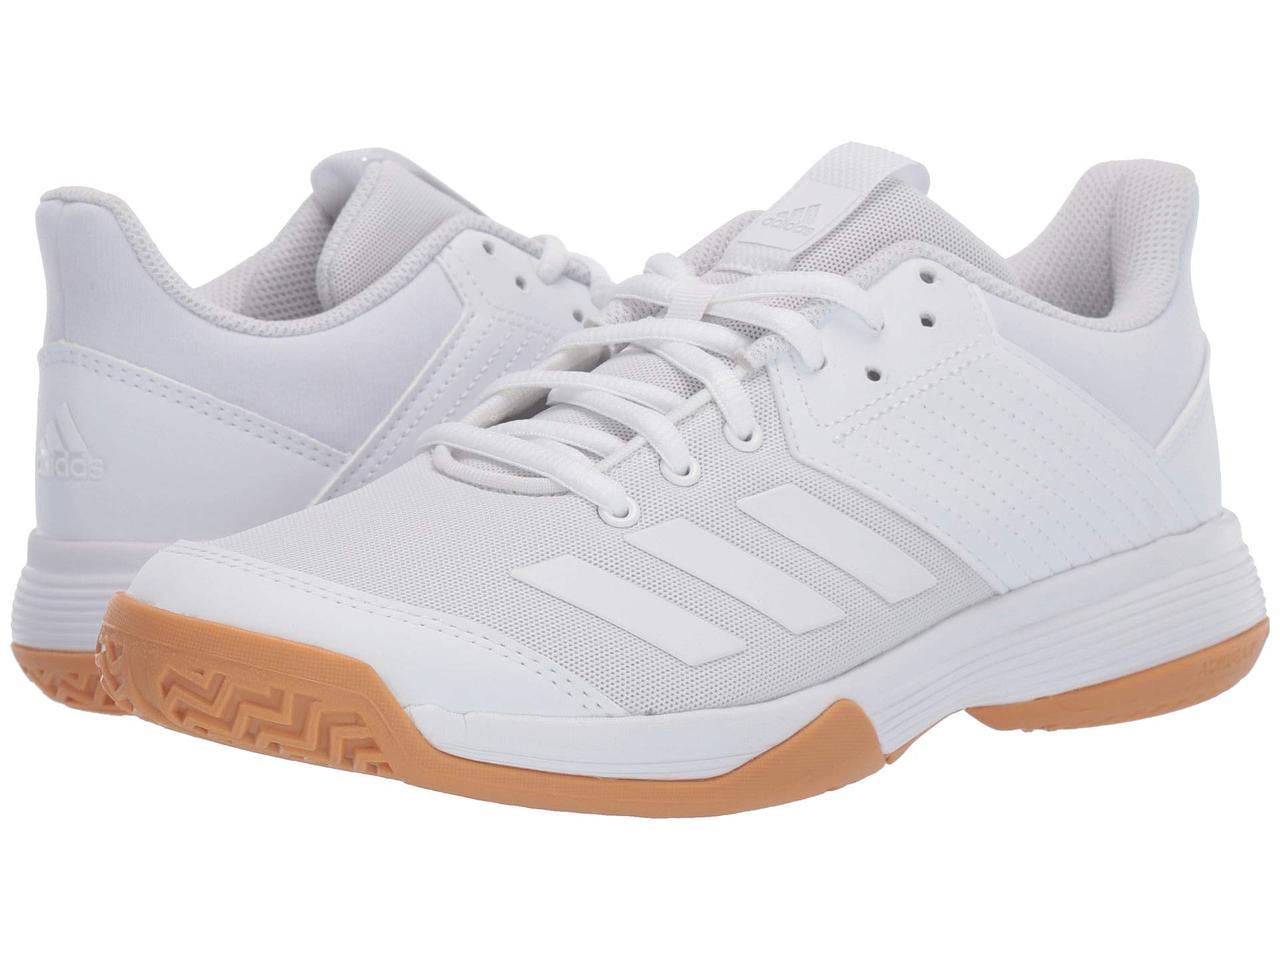 Кроссовки/Кеды (Оригинал) adidas Ligra 6 Footwear White/Footwear White/Gum M1